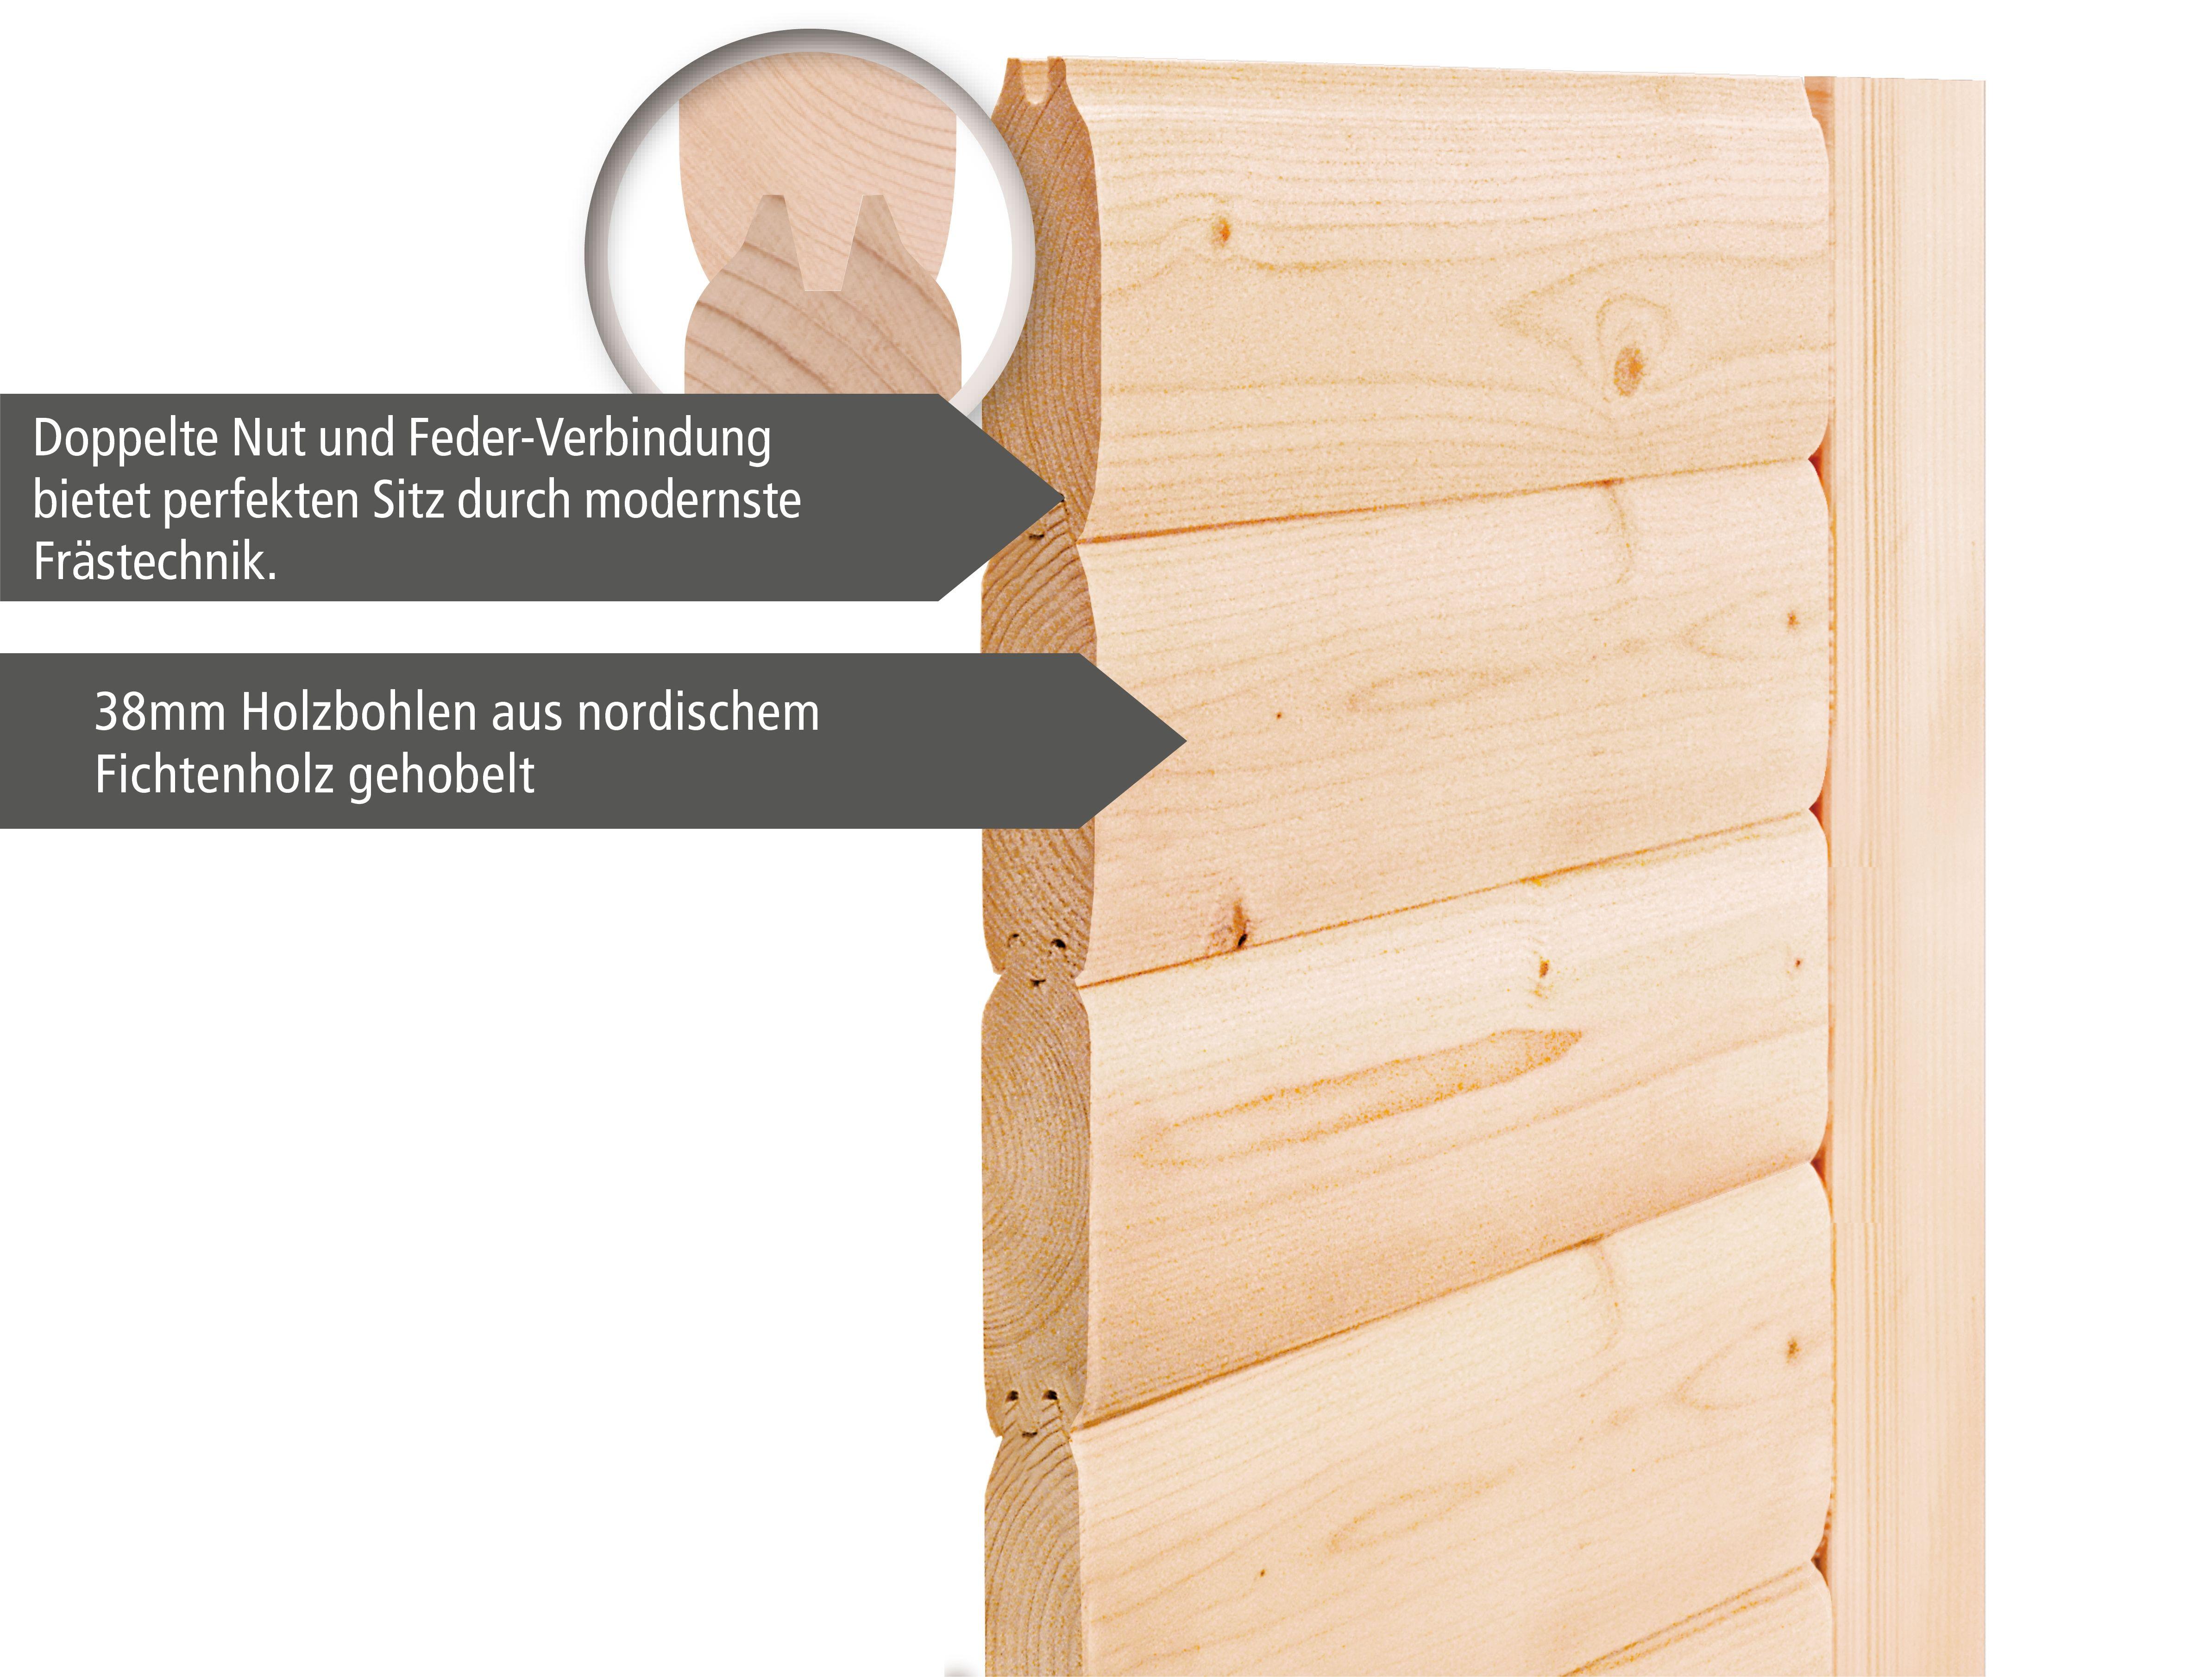 Woodfeeling Sauna Katja 38mm ohne Saunaofen Bild 9